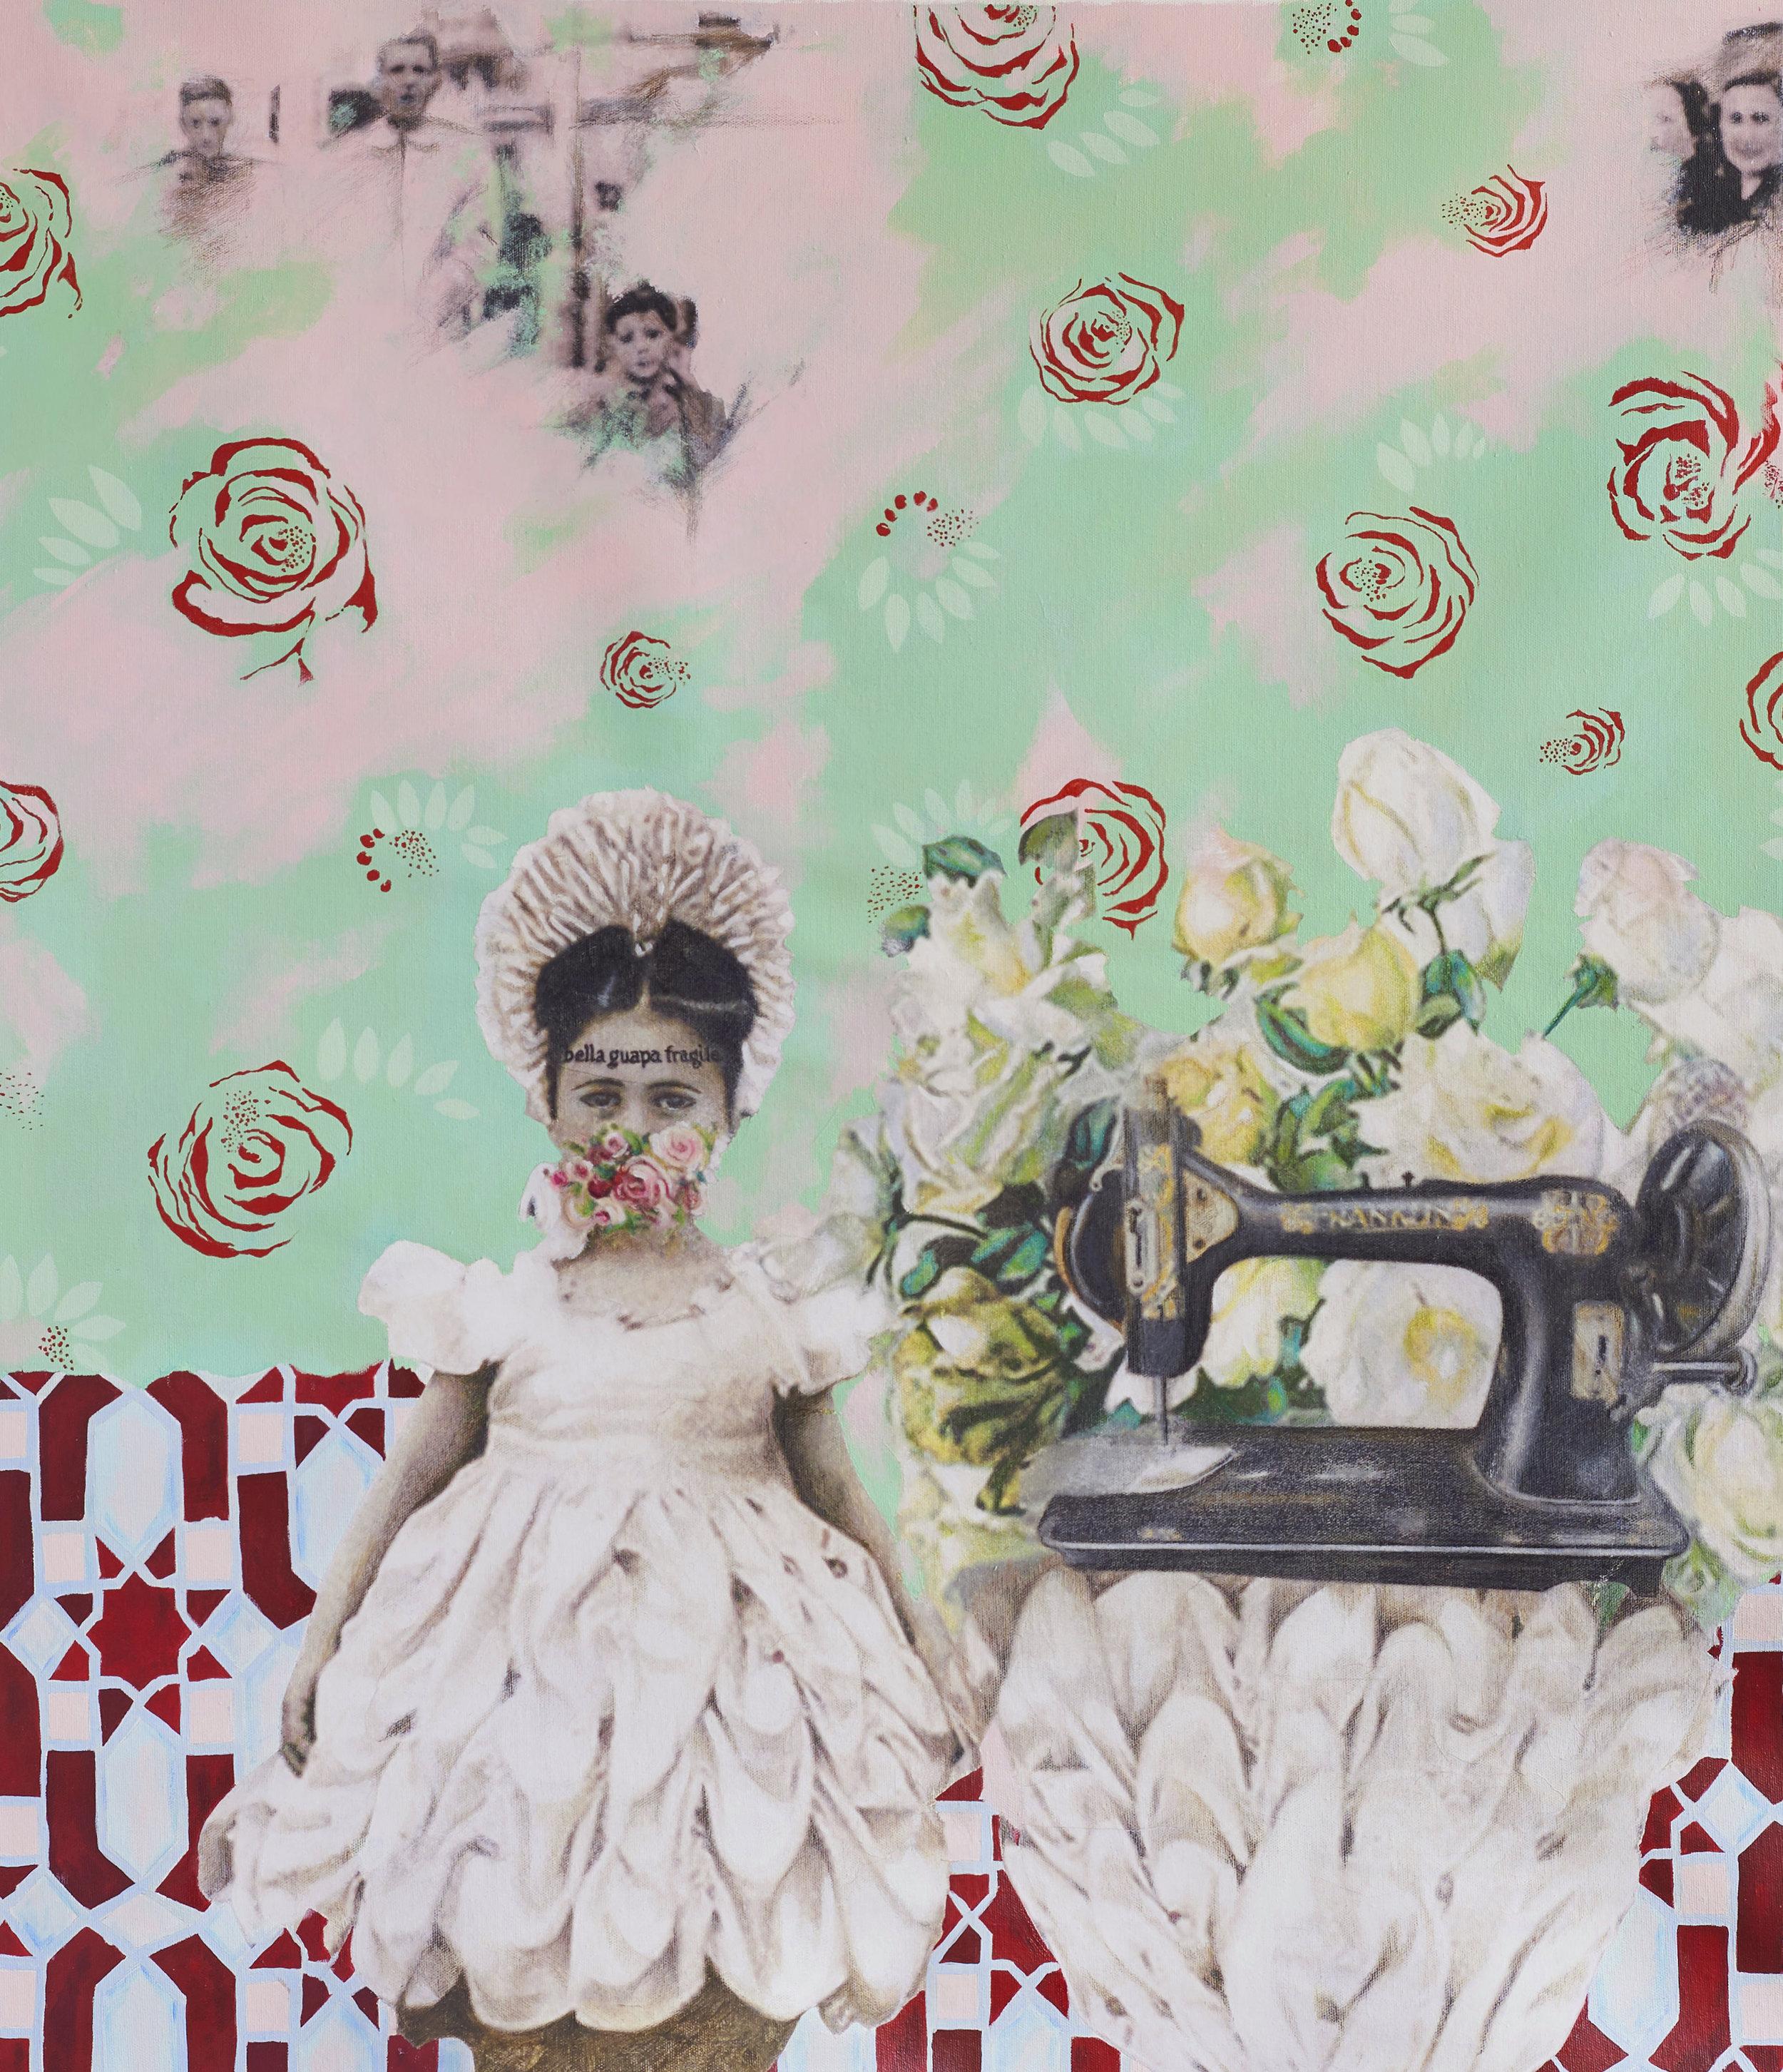 Wall Flower  2018-19 Acrylic, mixed medium on canvas 87x75 cm